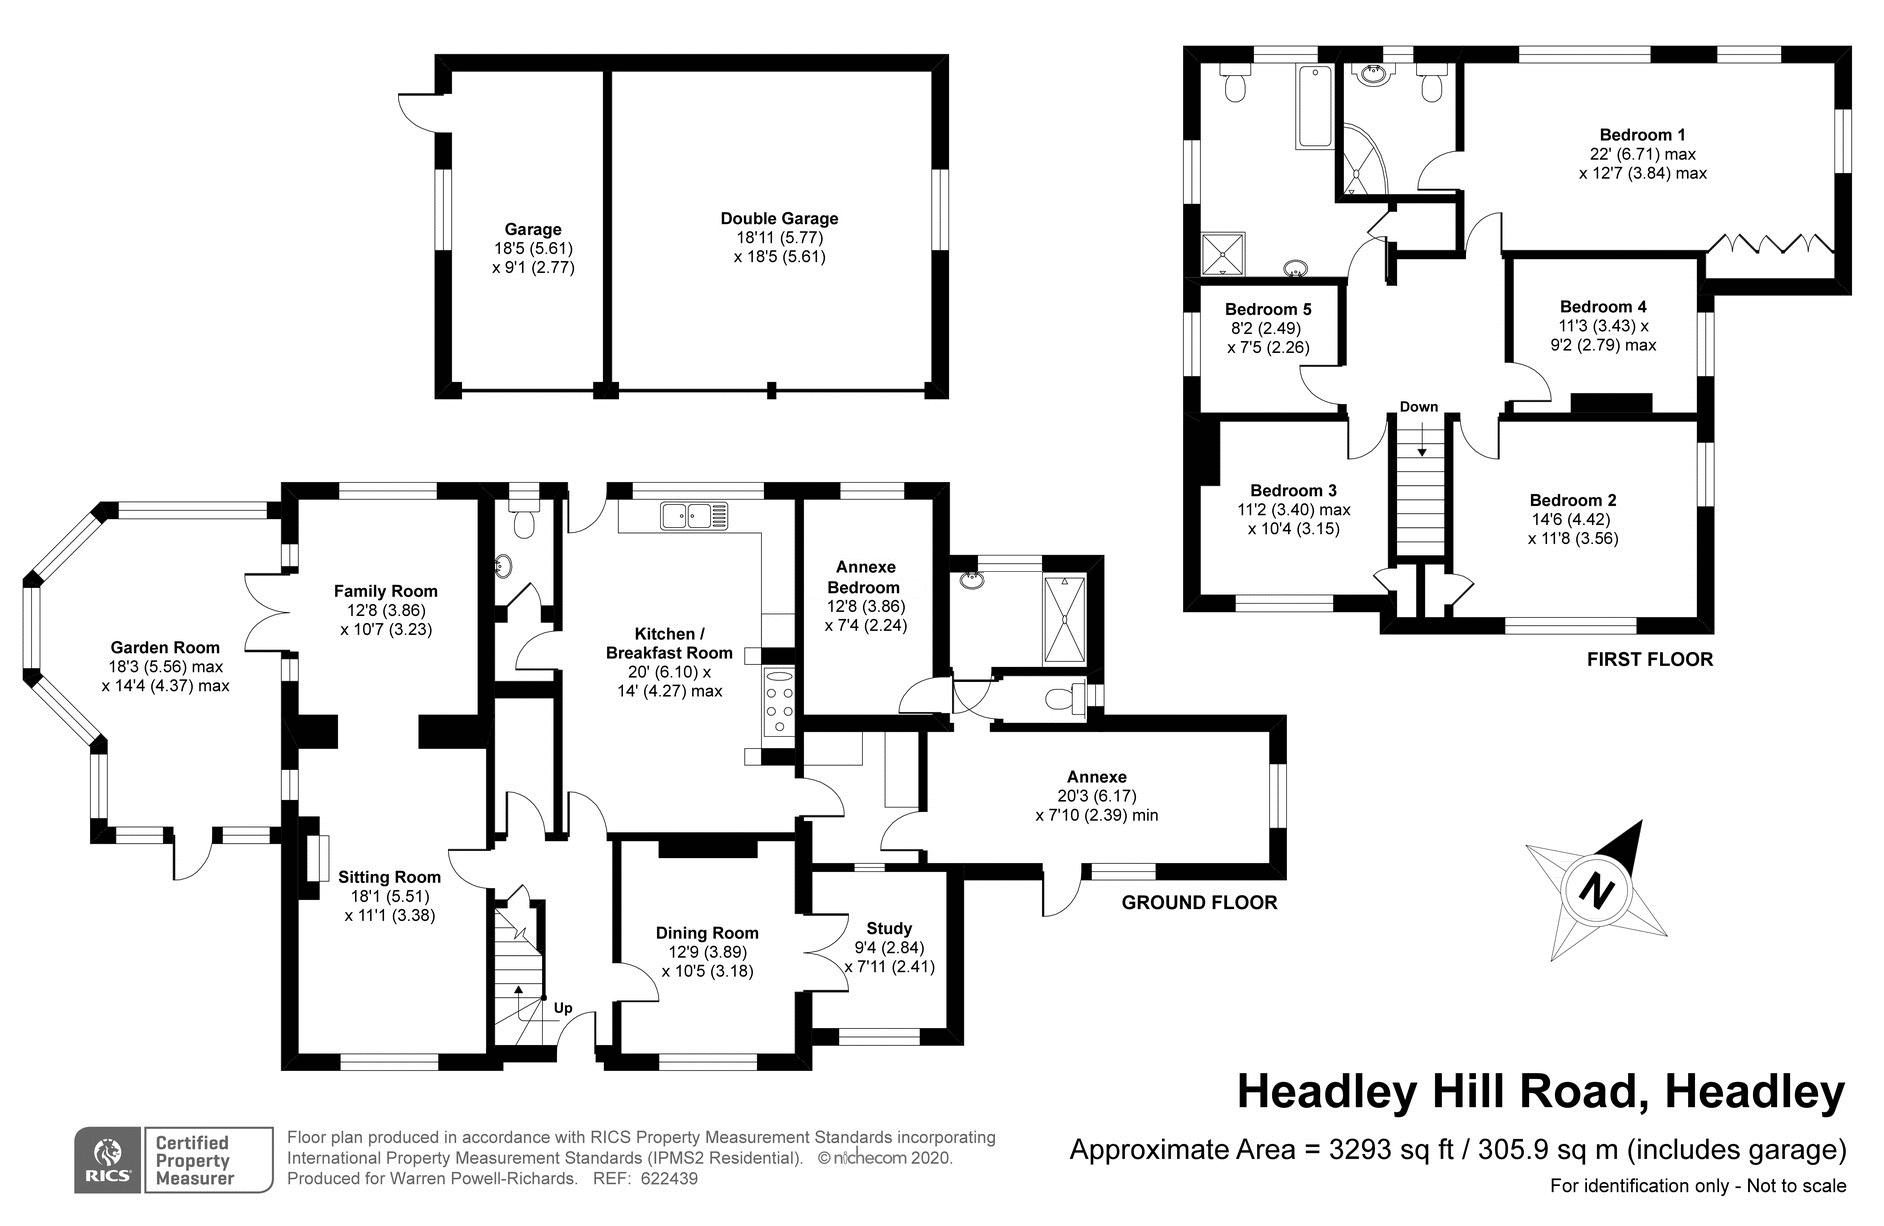 Headley Hill Road